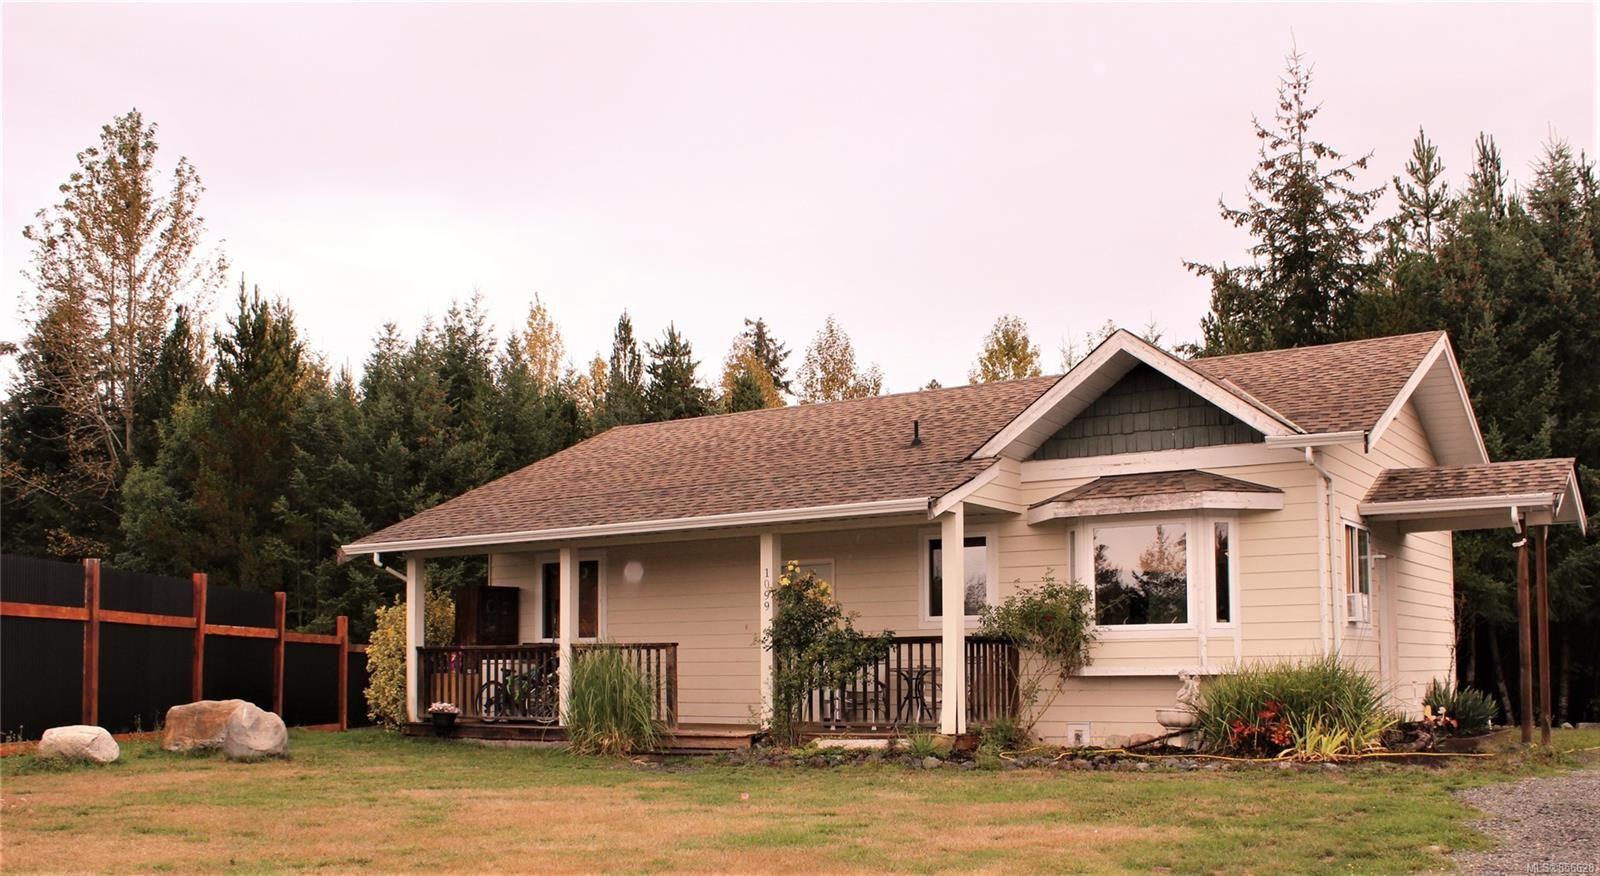 Main Photo: 1099 Sleepy Hollow Pl in Parksville: PQ Parksville House for sale (Parksville/Qualicum)  : MLS®# 856628